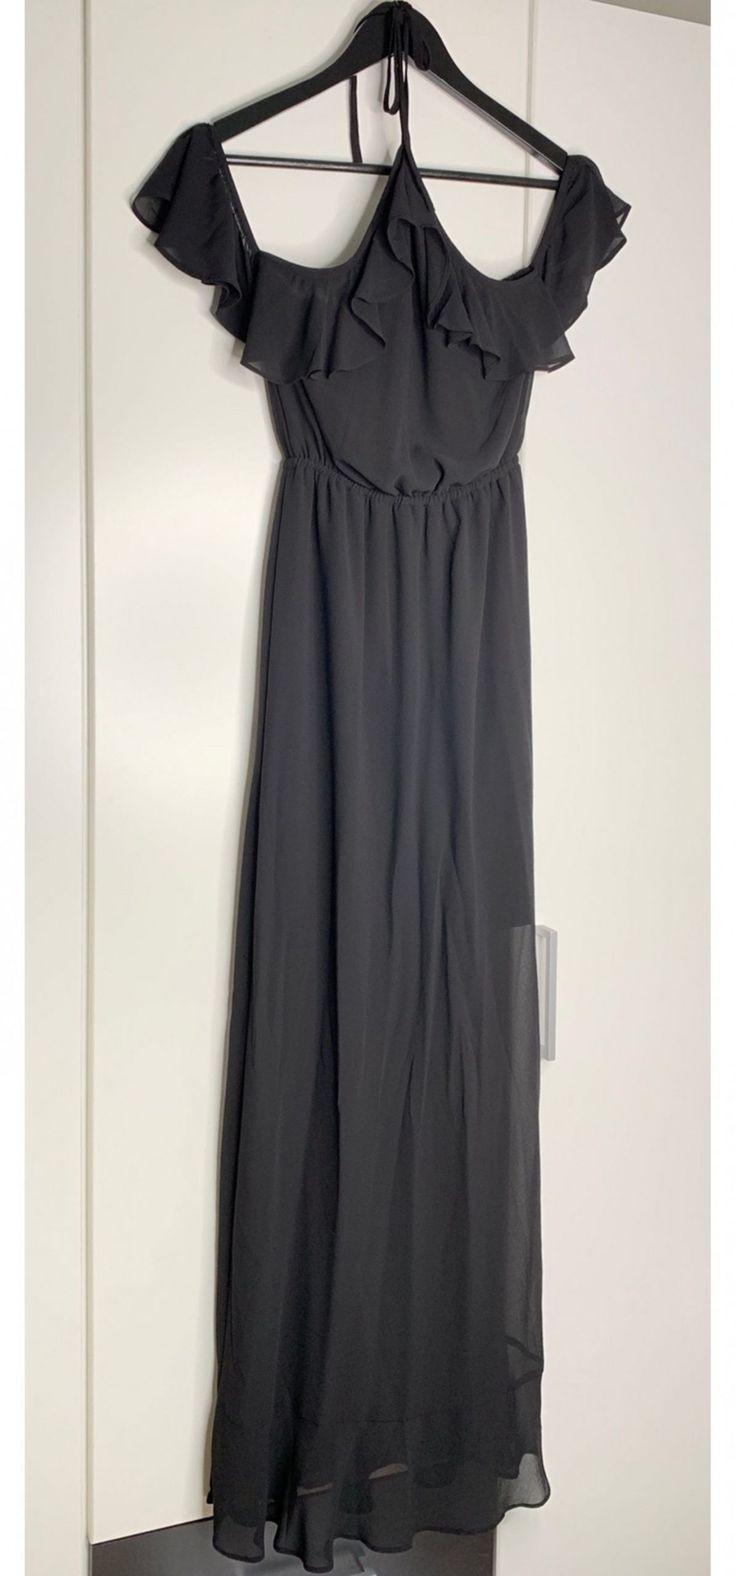 13 Schwarzes Bodenlanges Kleid In 2020  Bodenlange